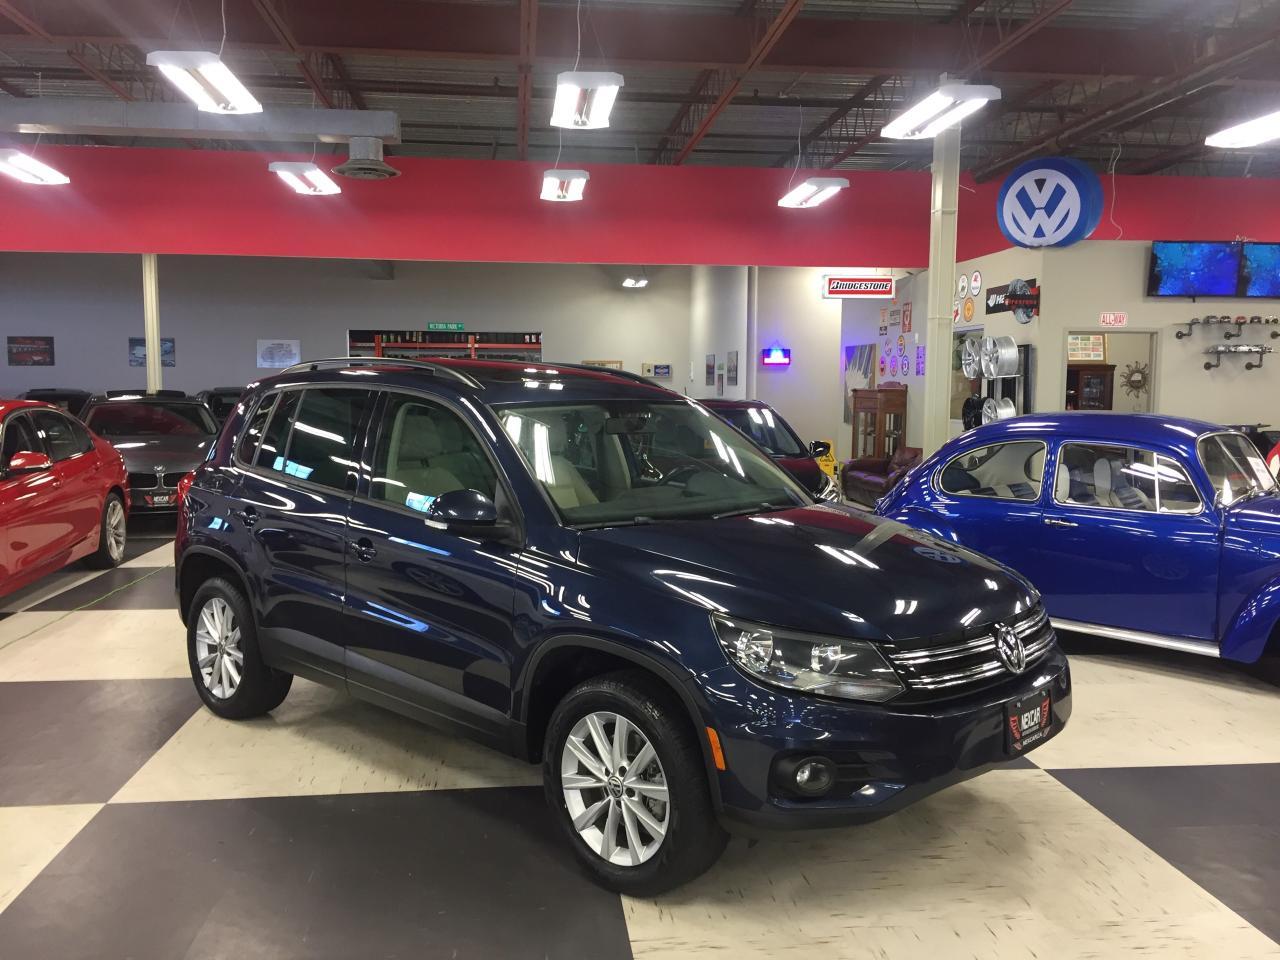 2014 Volkswagen Tiguan 2.0 TSI COMFORTLINE AUT0 AWD LEATHER PANO/ROOF 89K